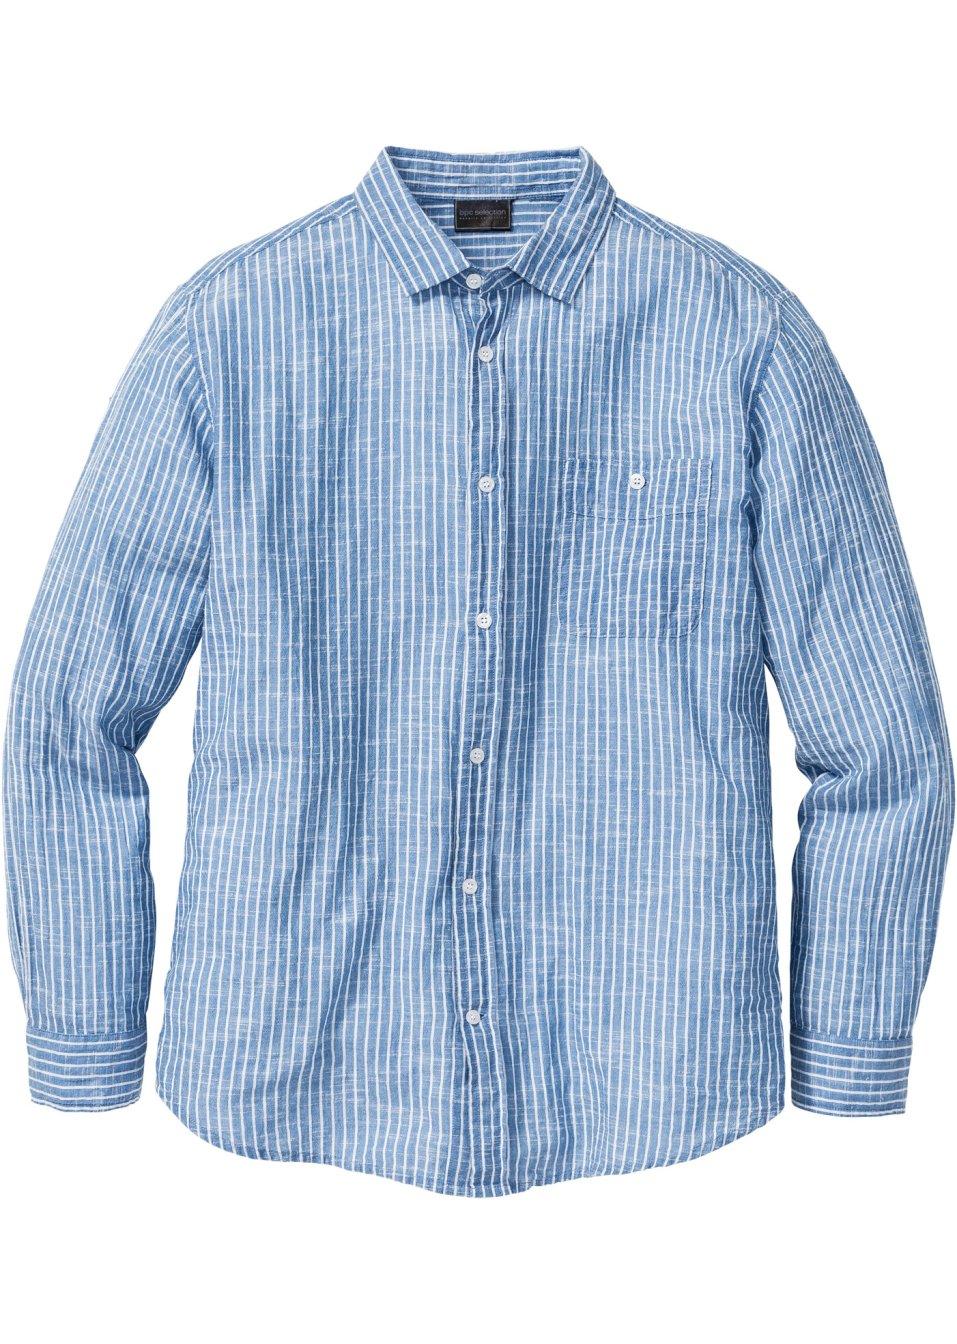 geschmackvolles hemd mit kent kragen blau wei gestreift. Black Bedroom Furniture Sets. Home Design Ideas